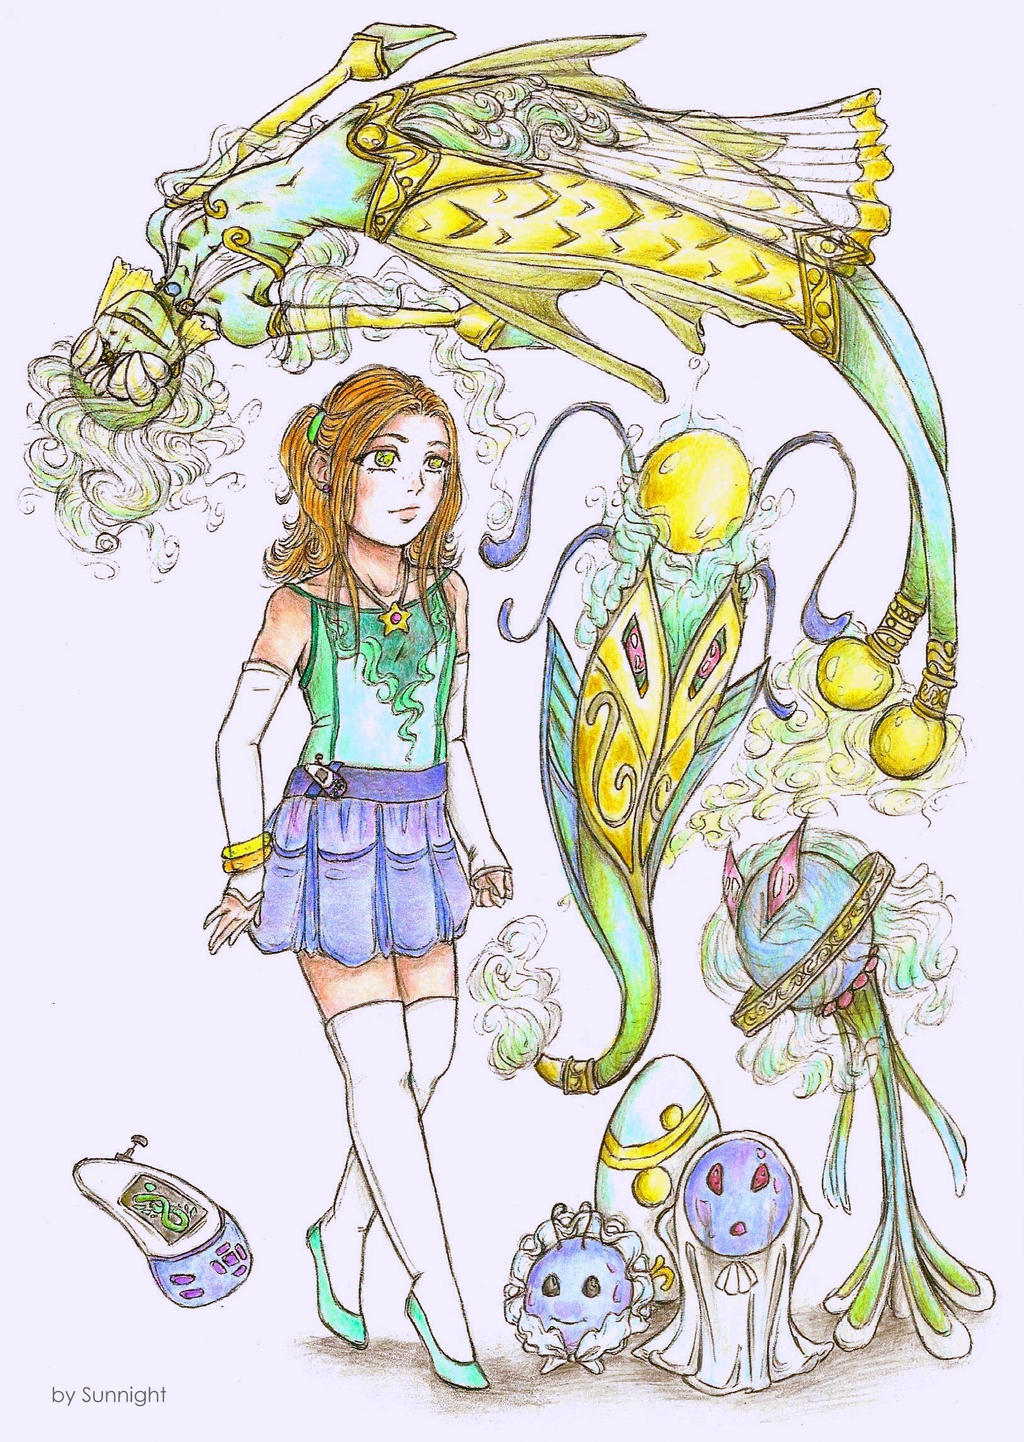 Sarah Snow with their Digimon Maraquelmon (colo) by sunnight1